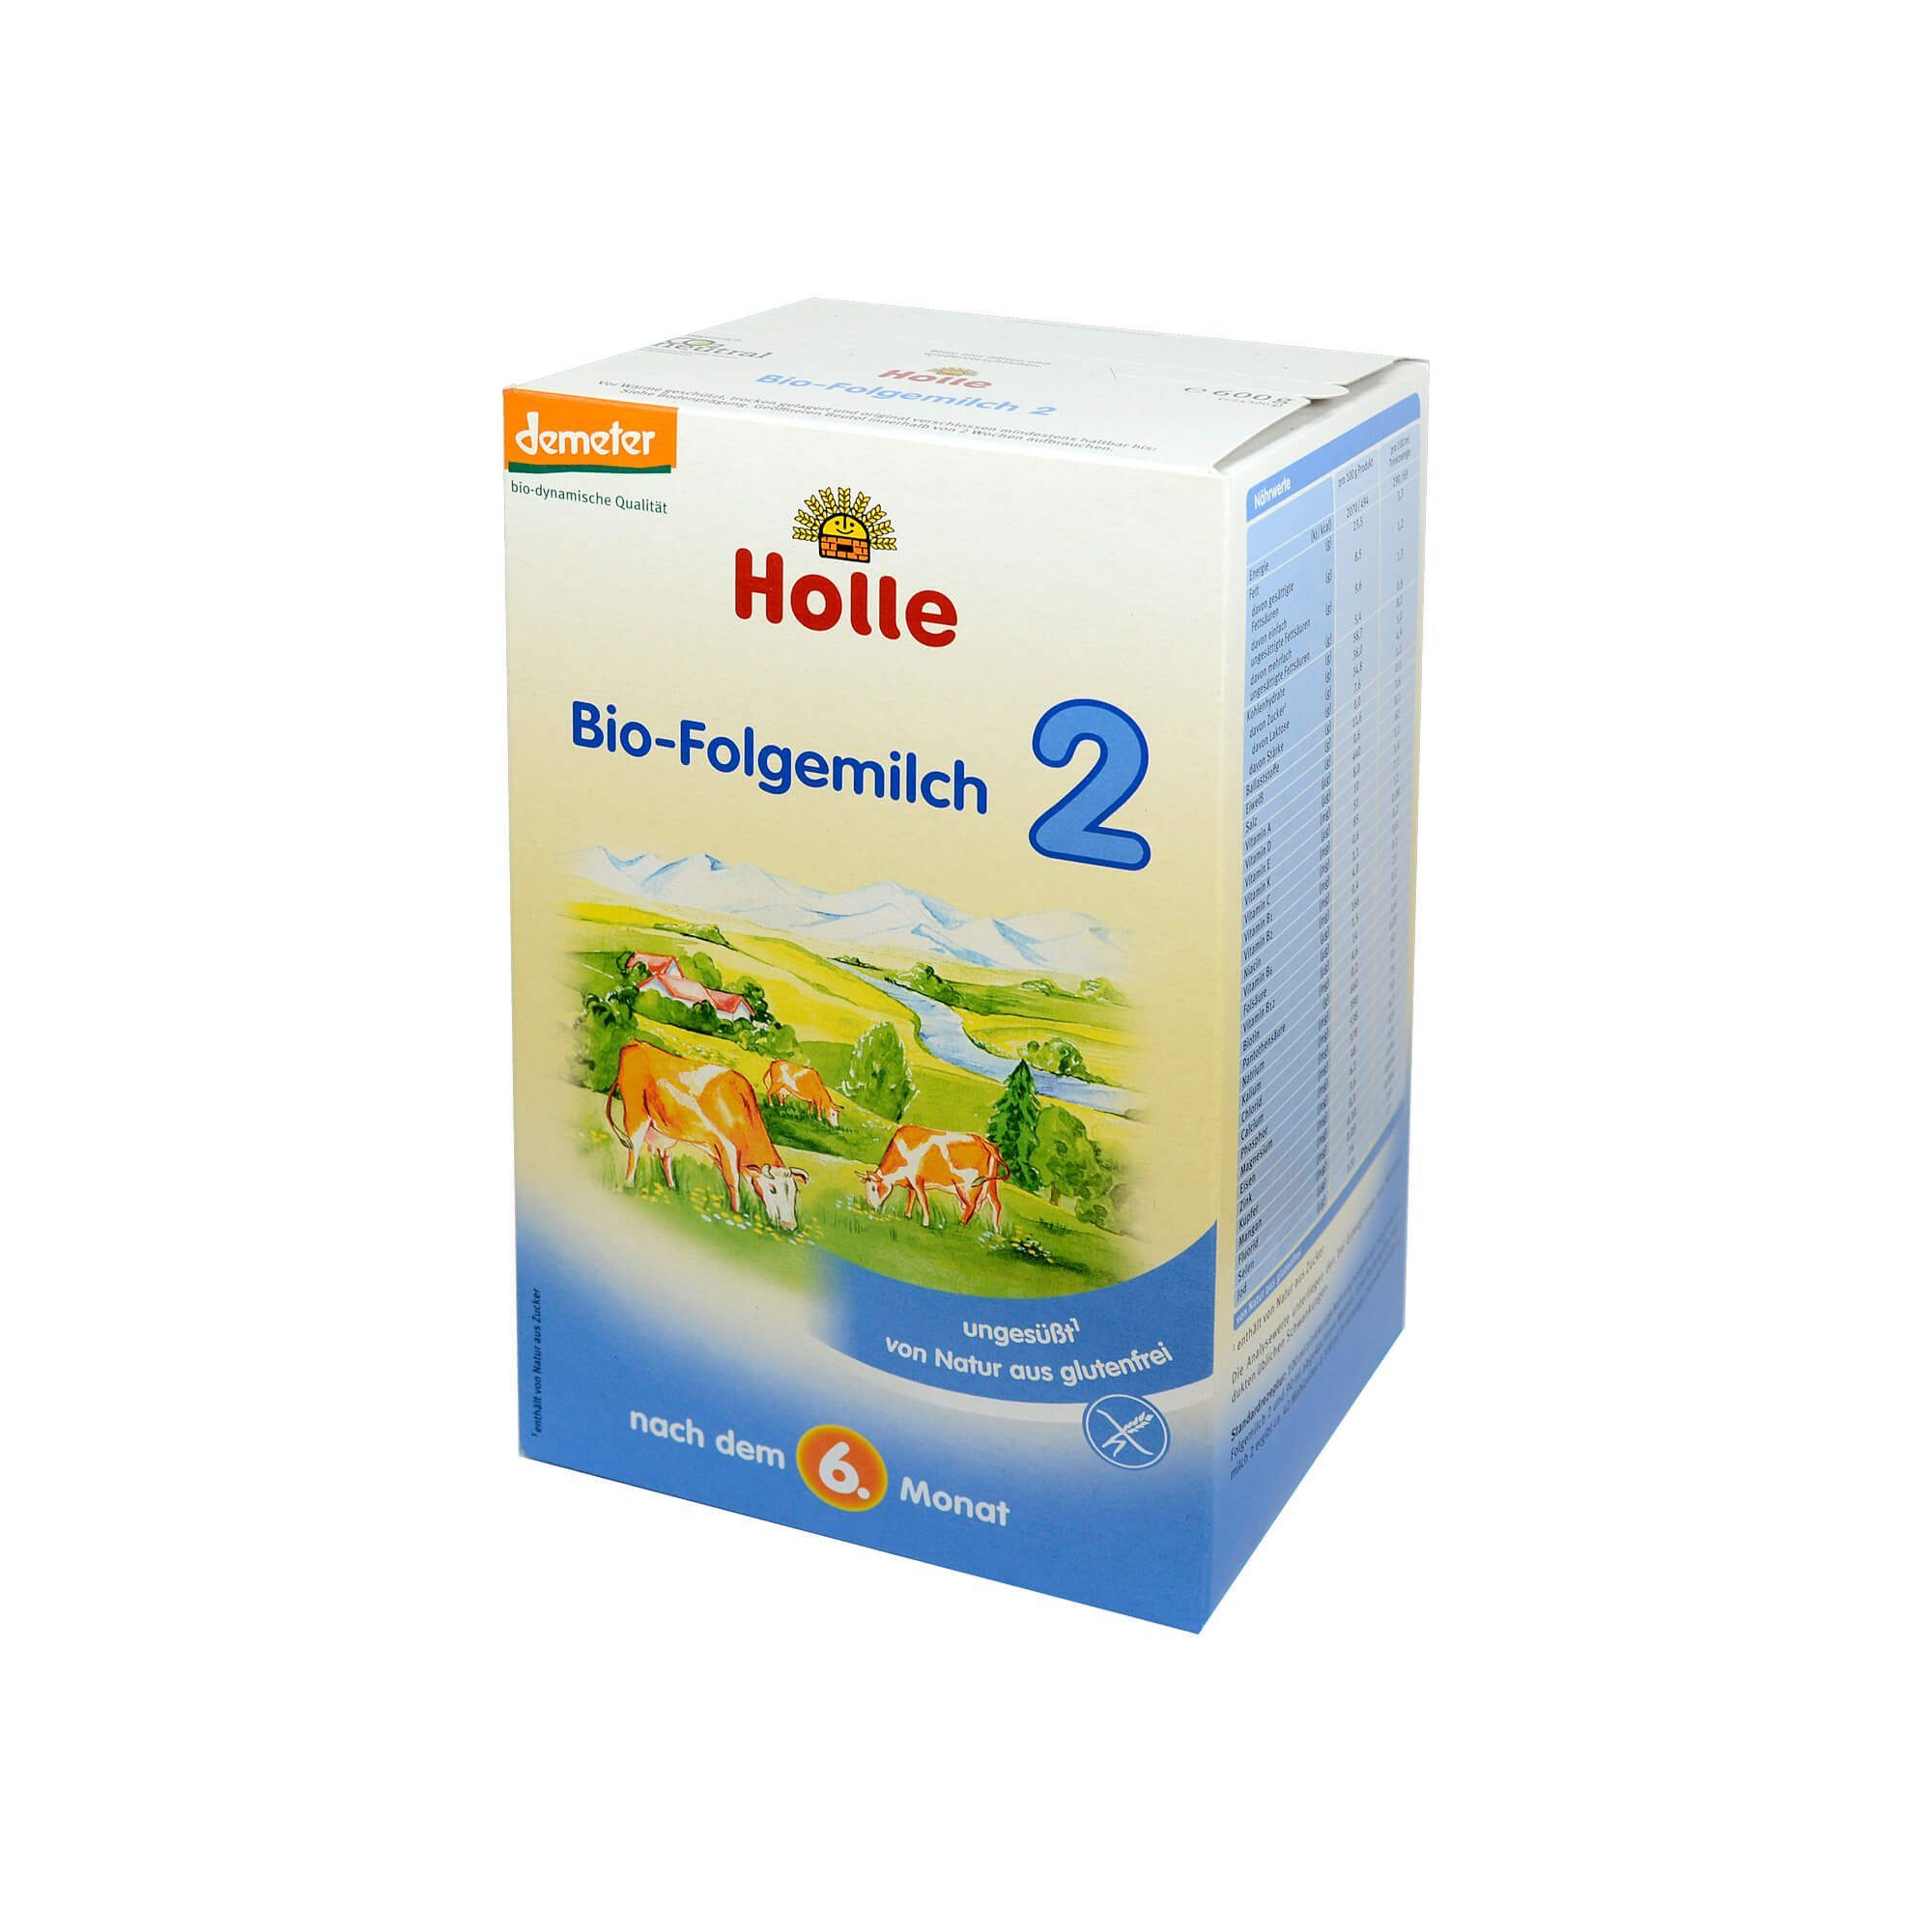 Holle Bio Säuglings Folgemilch 2, 600 g